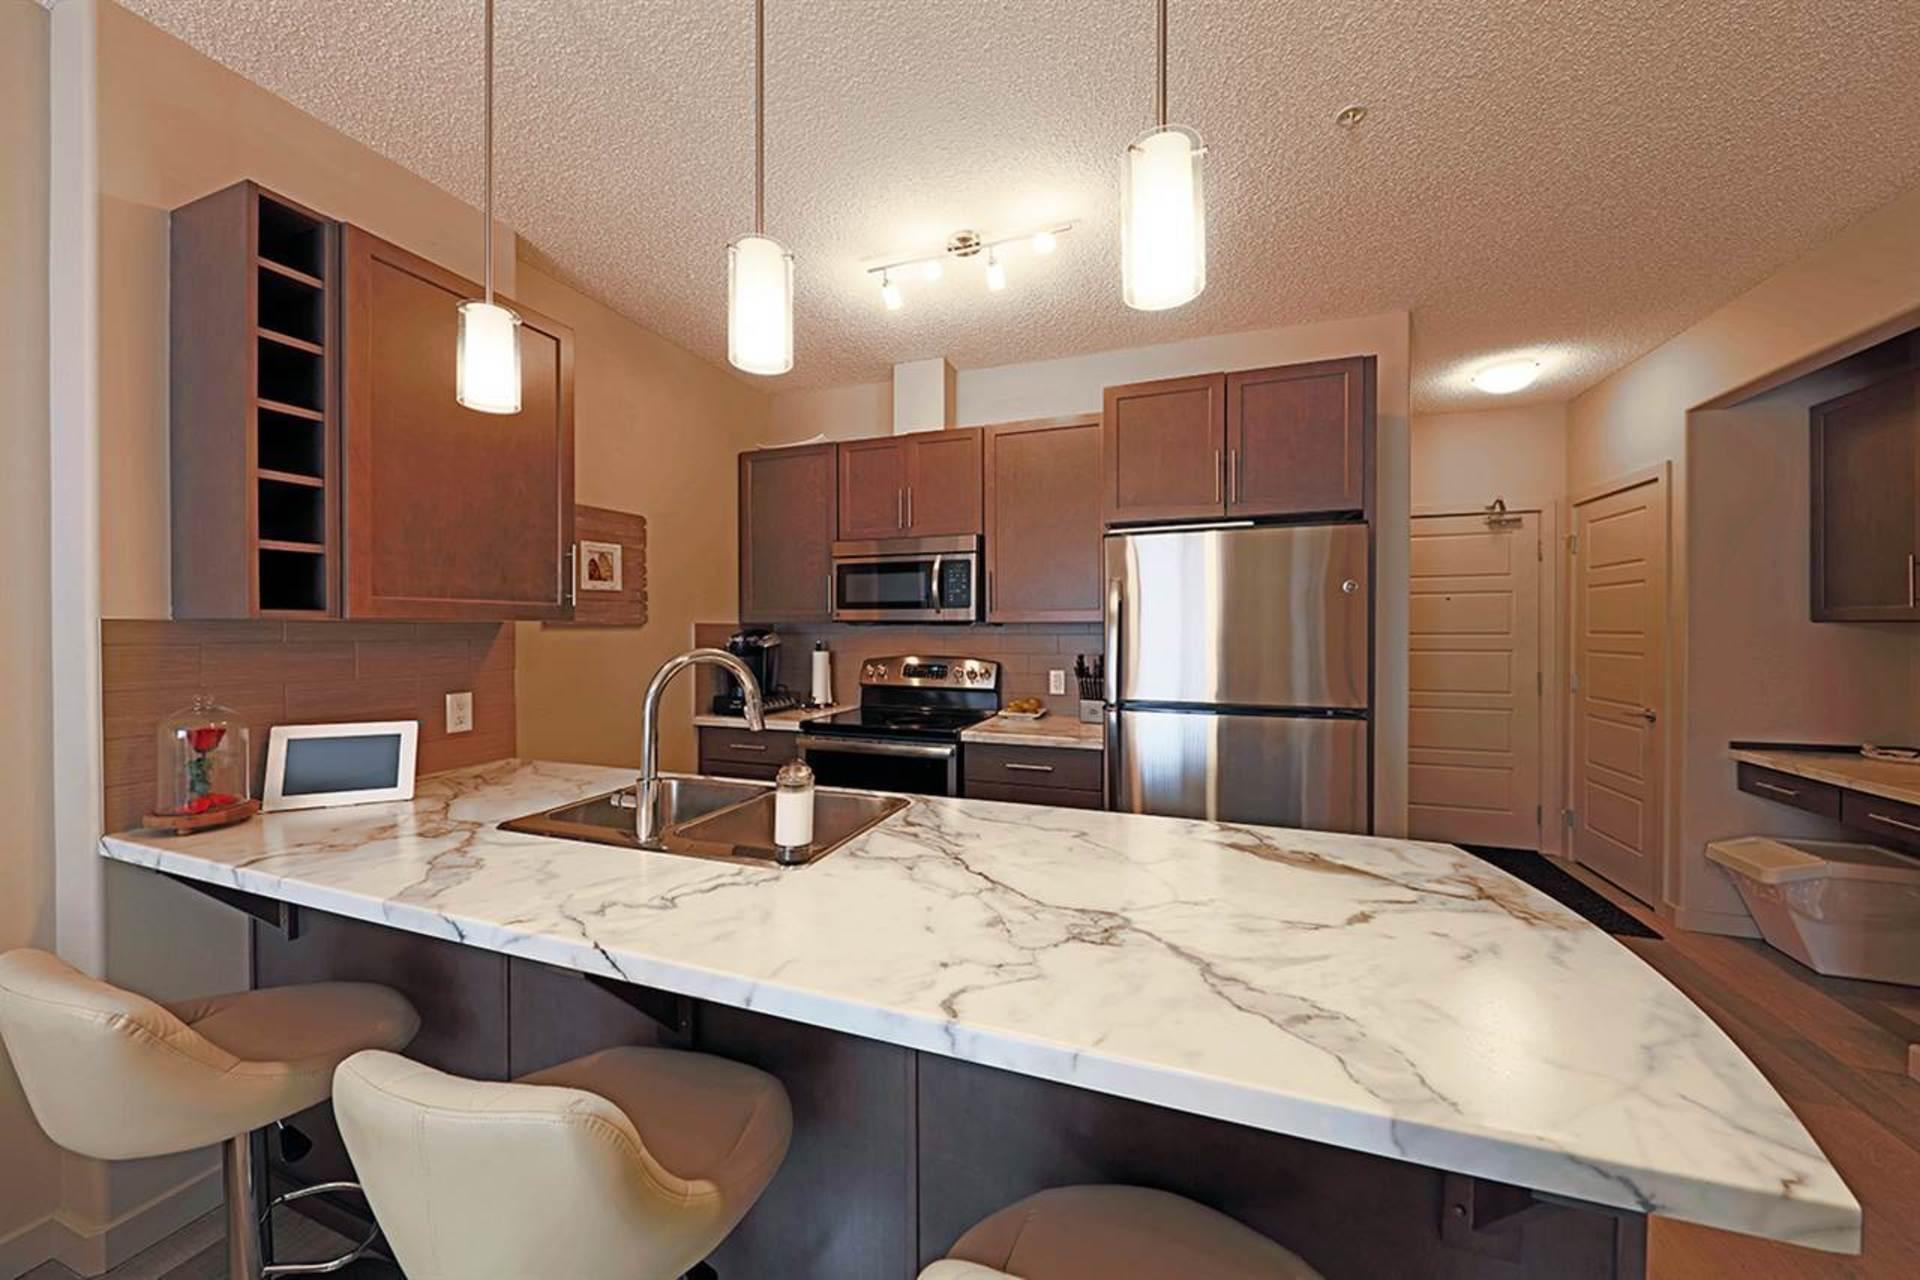 1004-rosenthal-boulevard-rosenthal_edmo-edmonton-04 at 217 - 1004 Rosenthal Boulevard, Rosenthal_EDMO, Edmonton